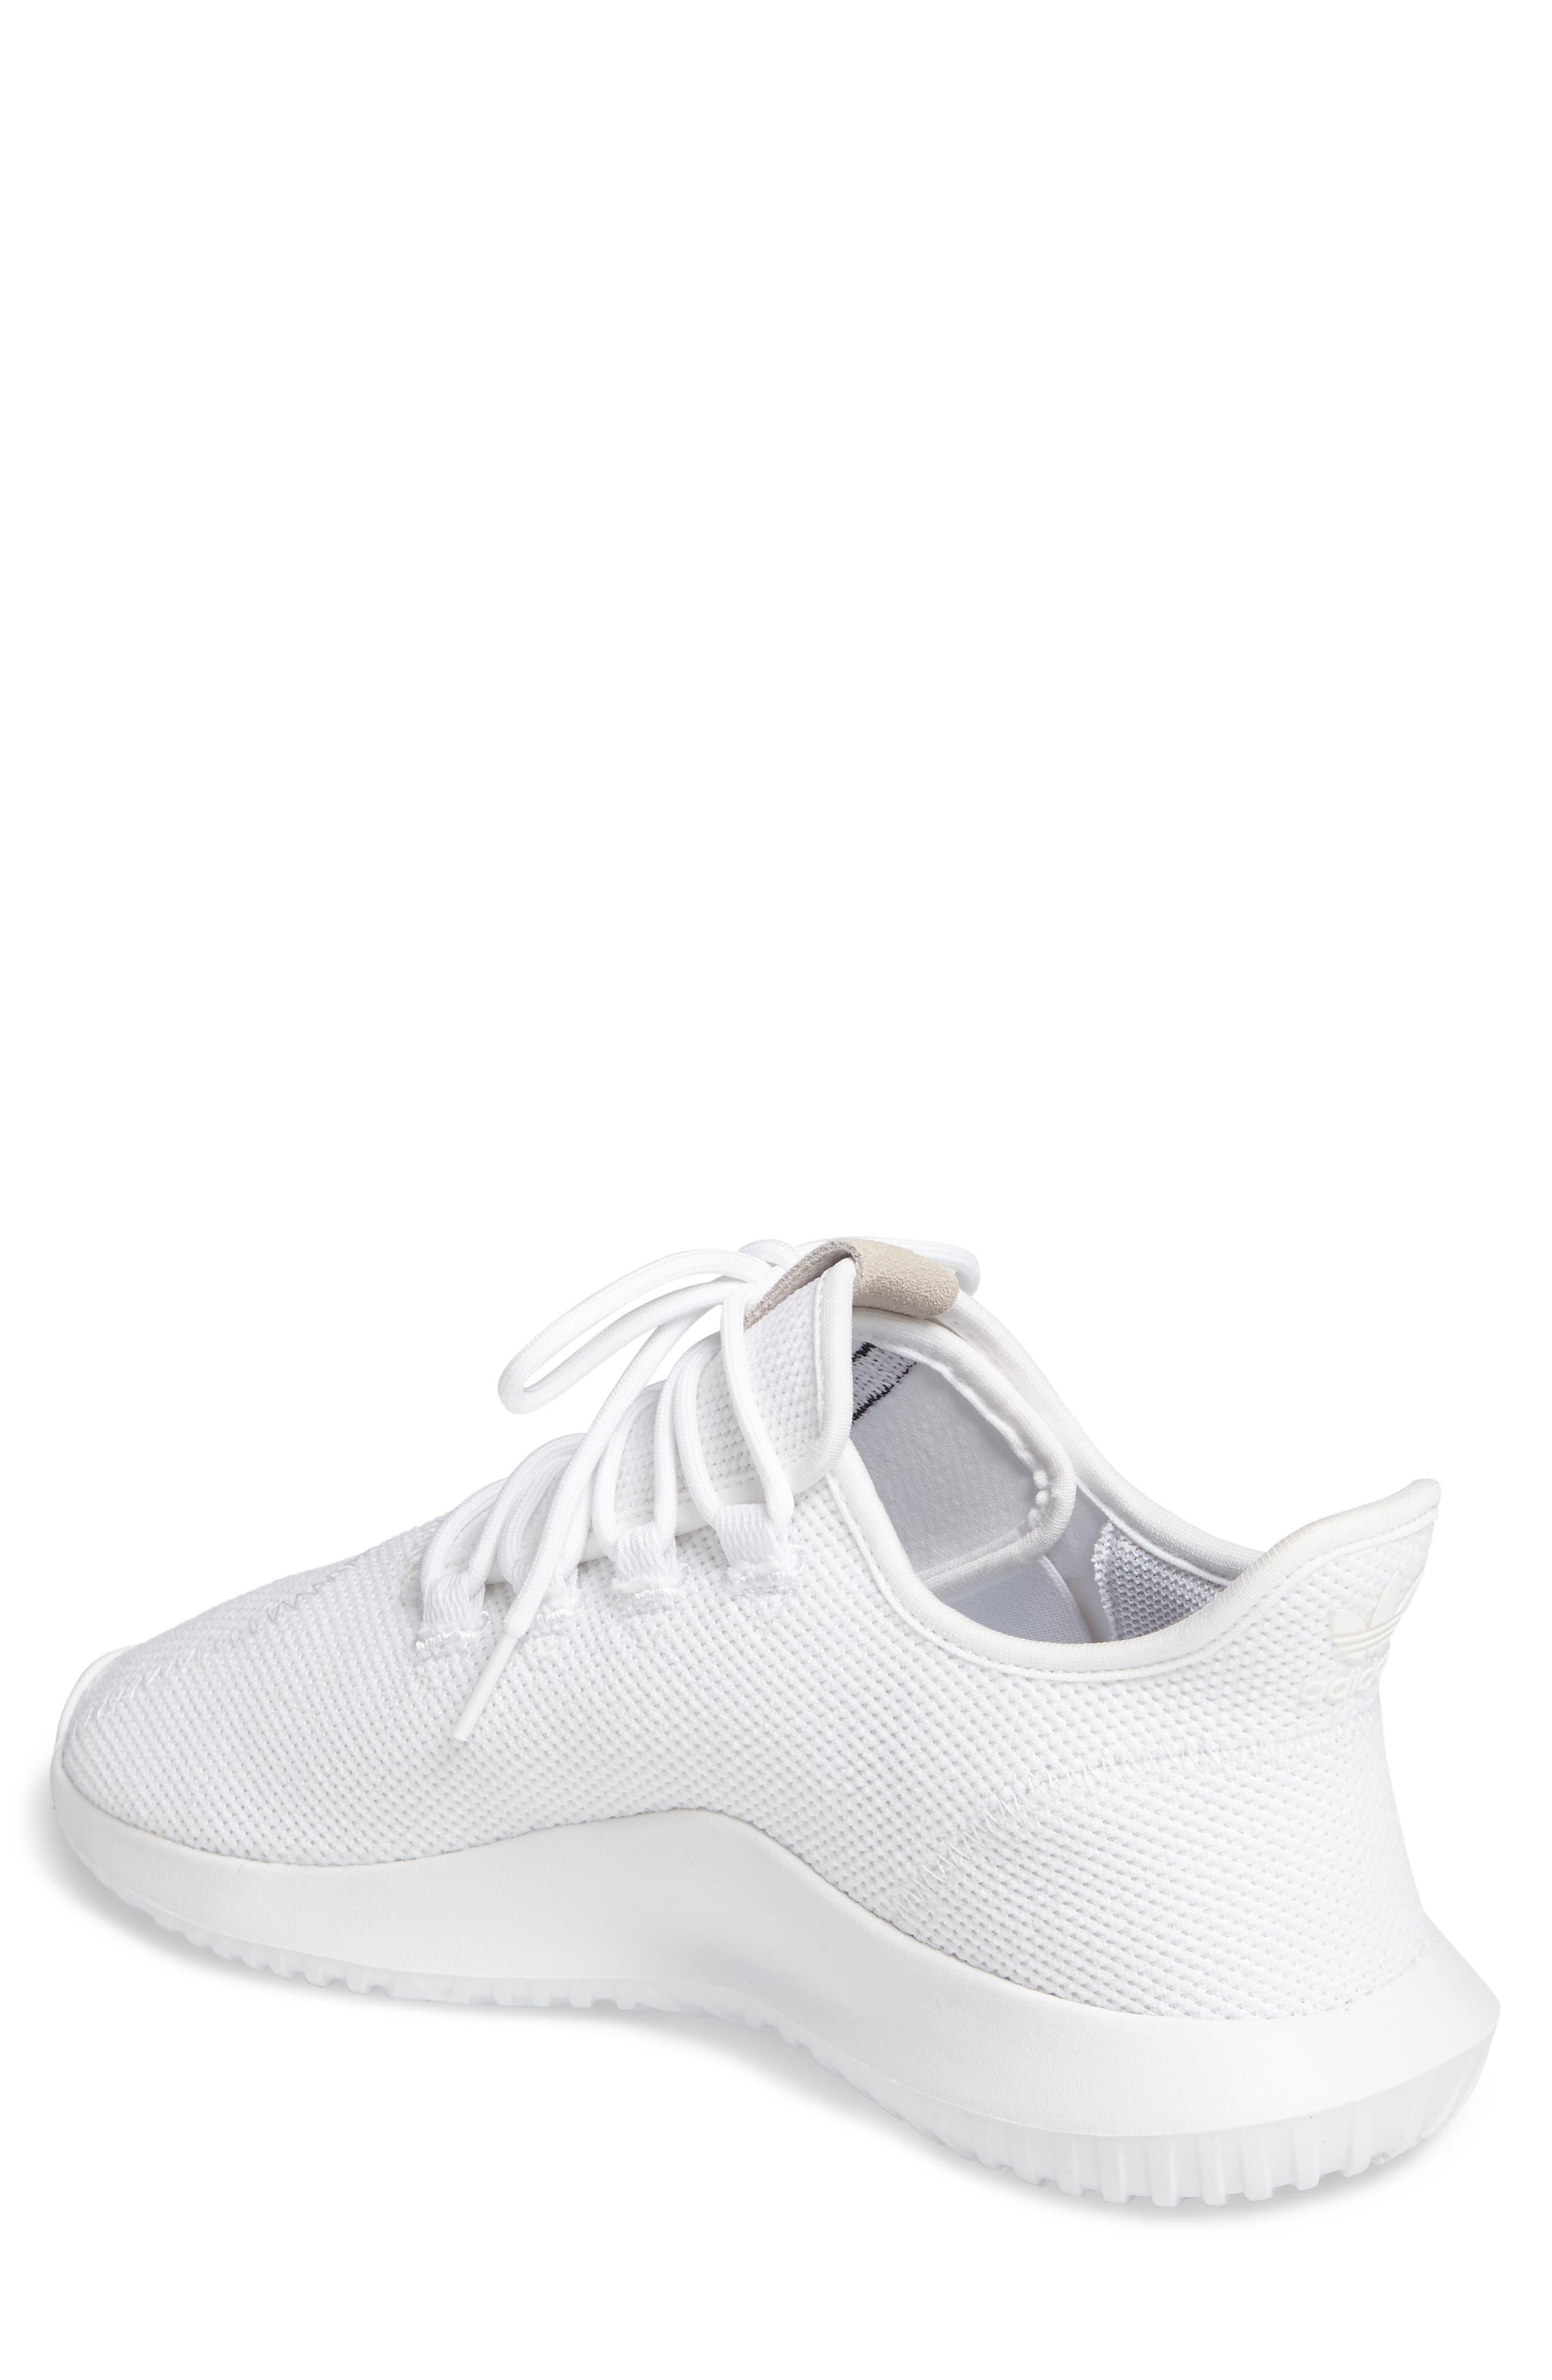 Tubular Shadow Sneaker,                             Alternate thumbnail 2, color,                             White/ Core Black/ White